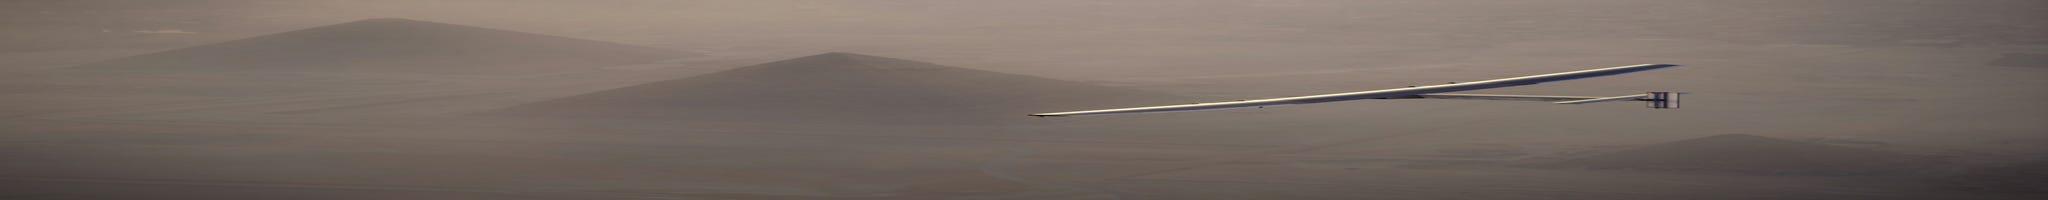 Solar Impulse 2 takes off on